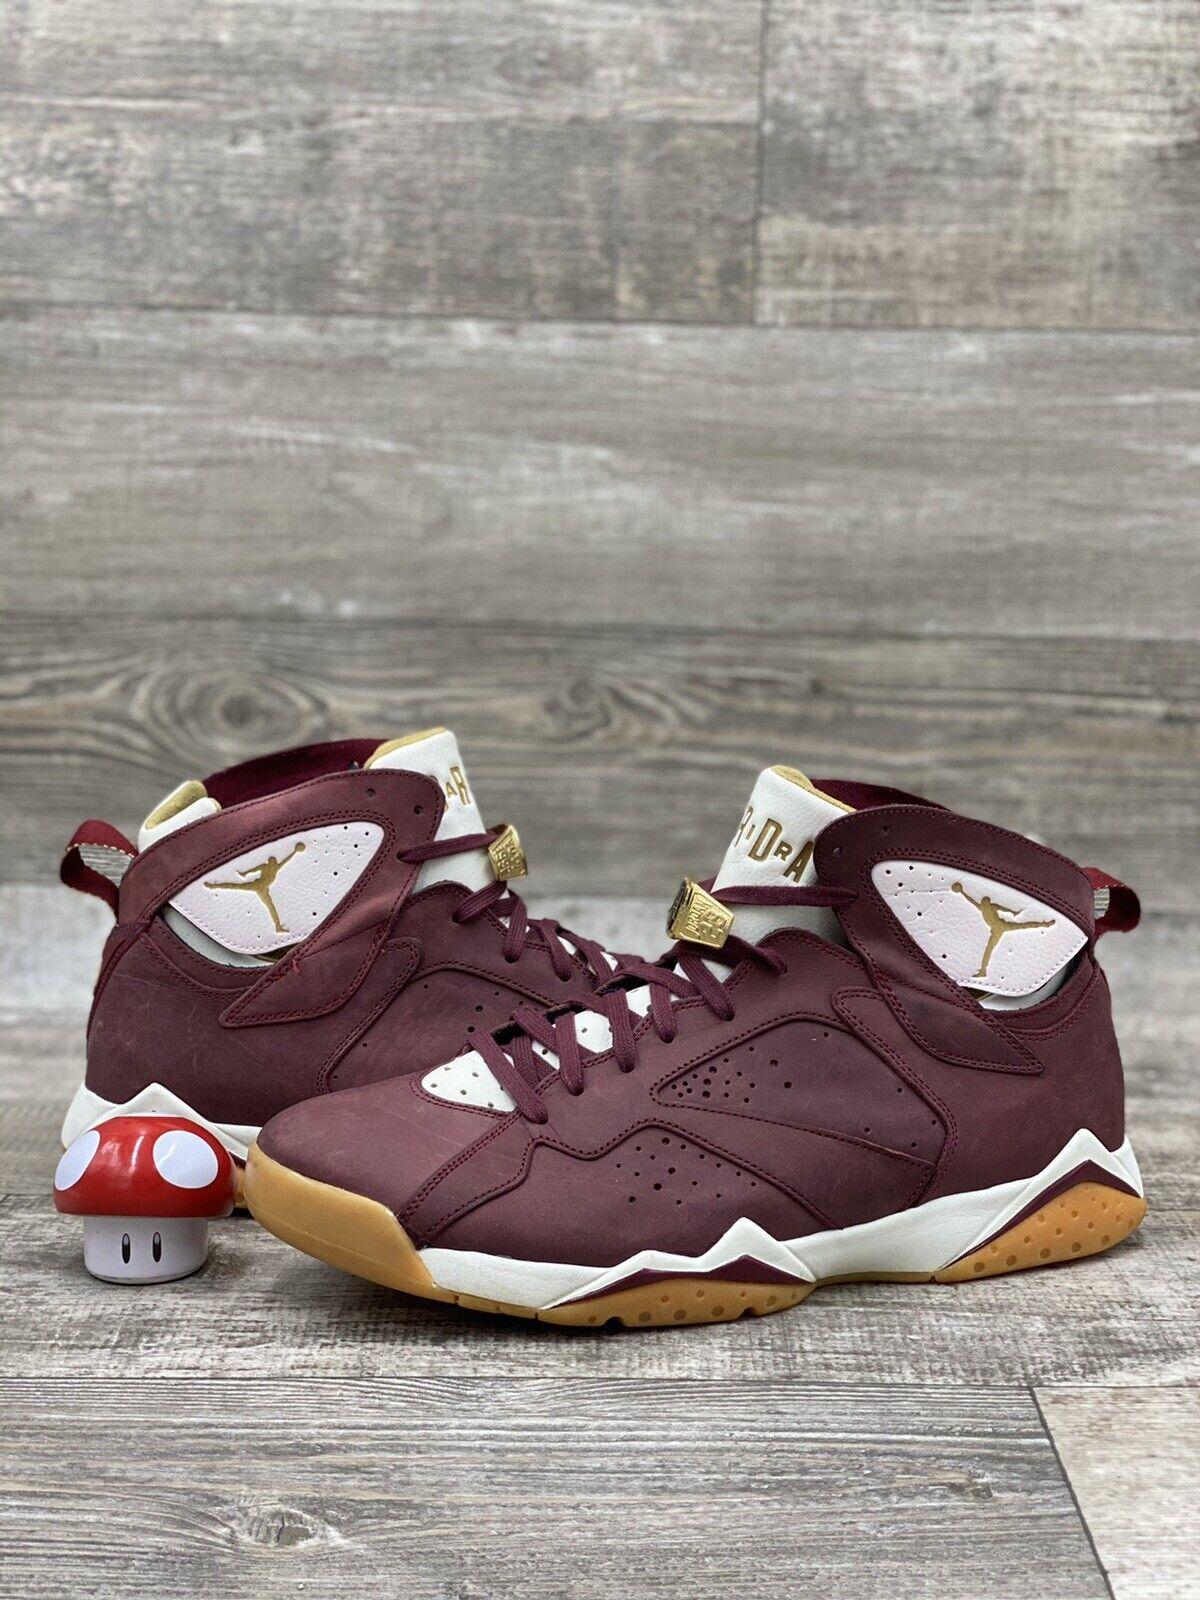 Nike Air Jordan VII 7 Retro C\u0026c Sz 12